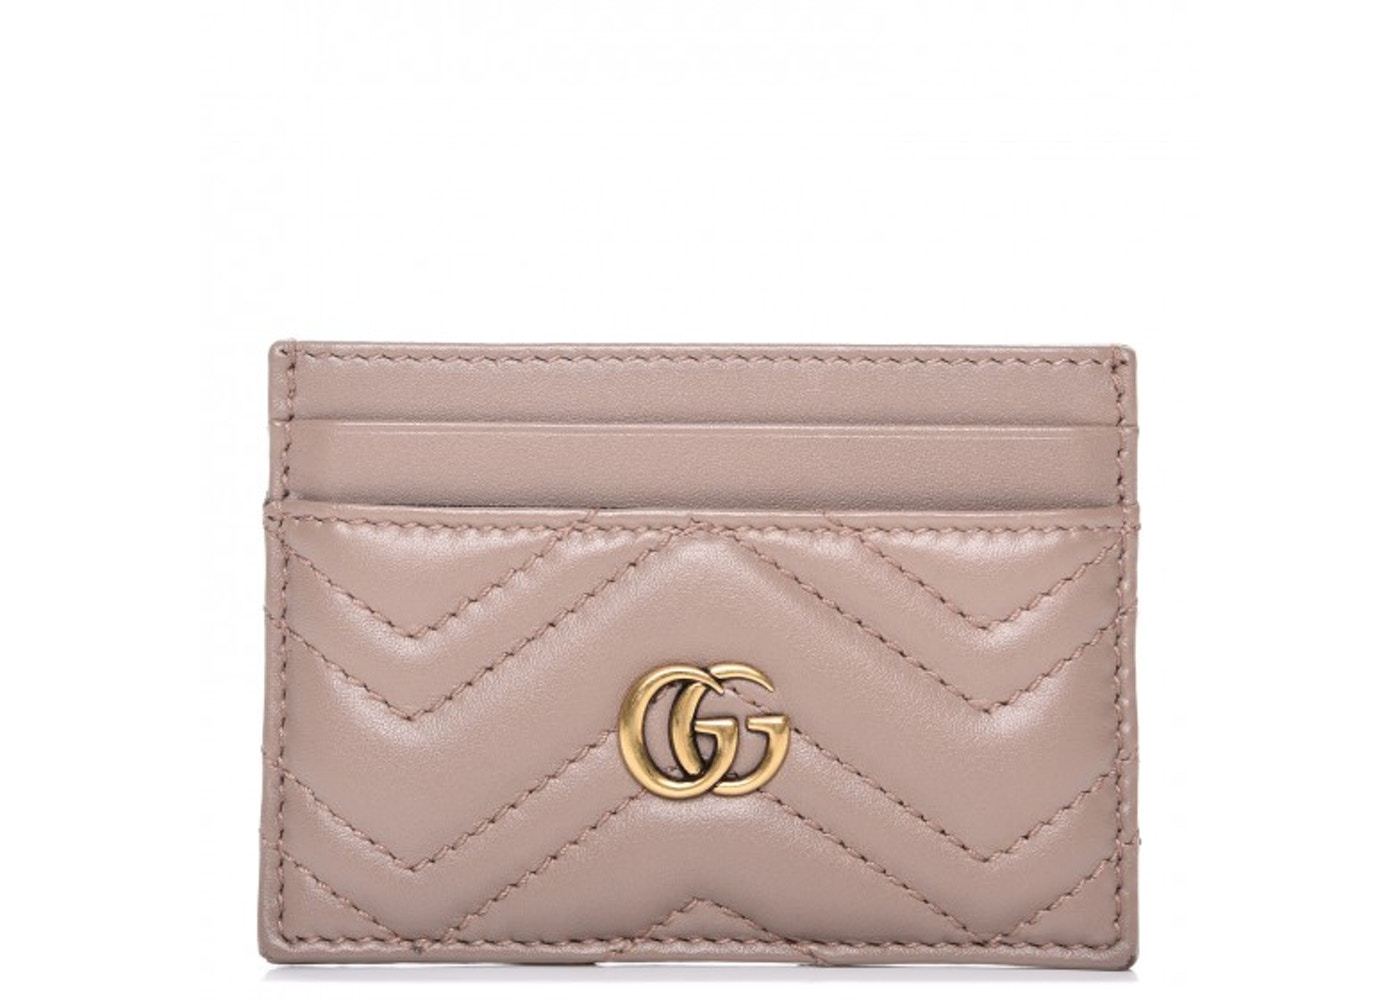 5119eaebd579 Buy & Sell Gucci Luxury Handbags